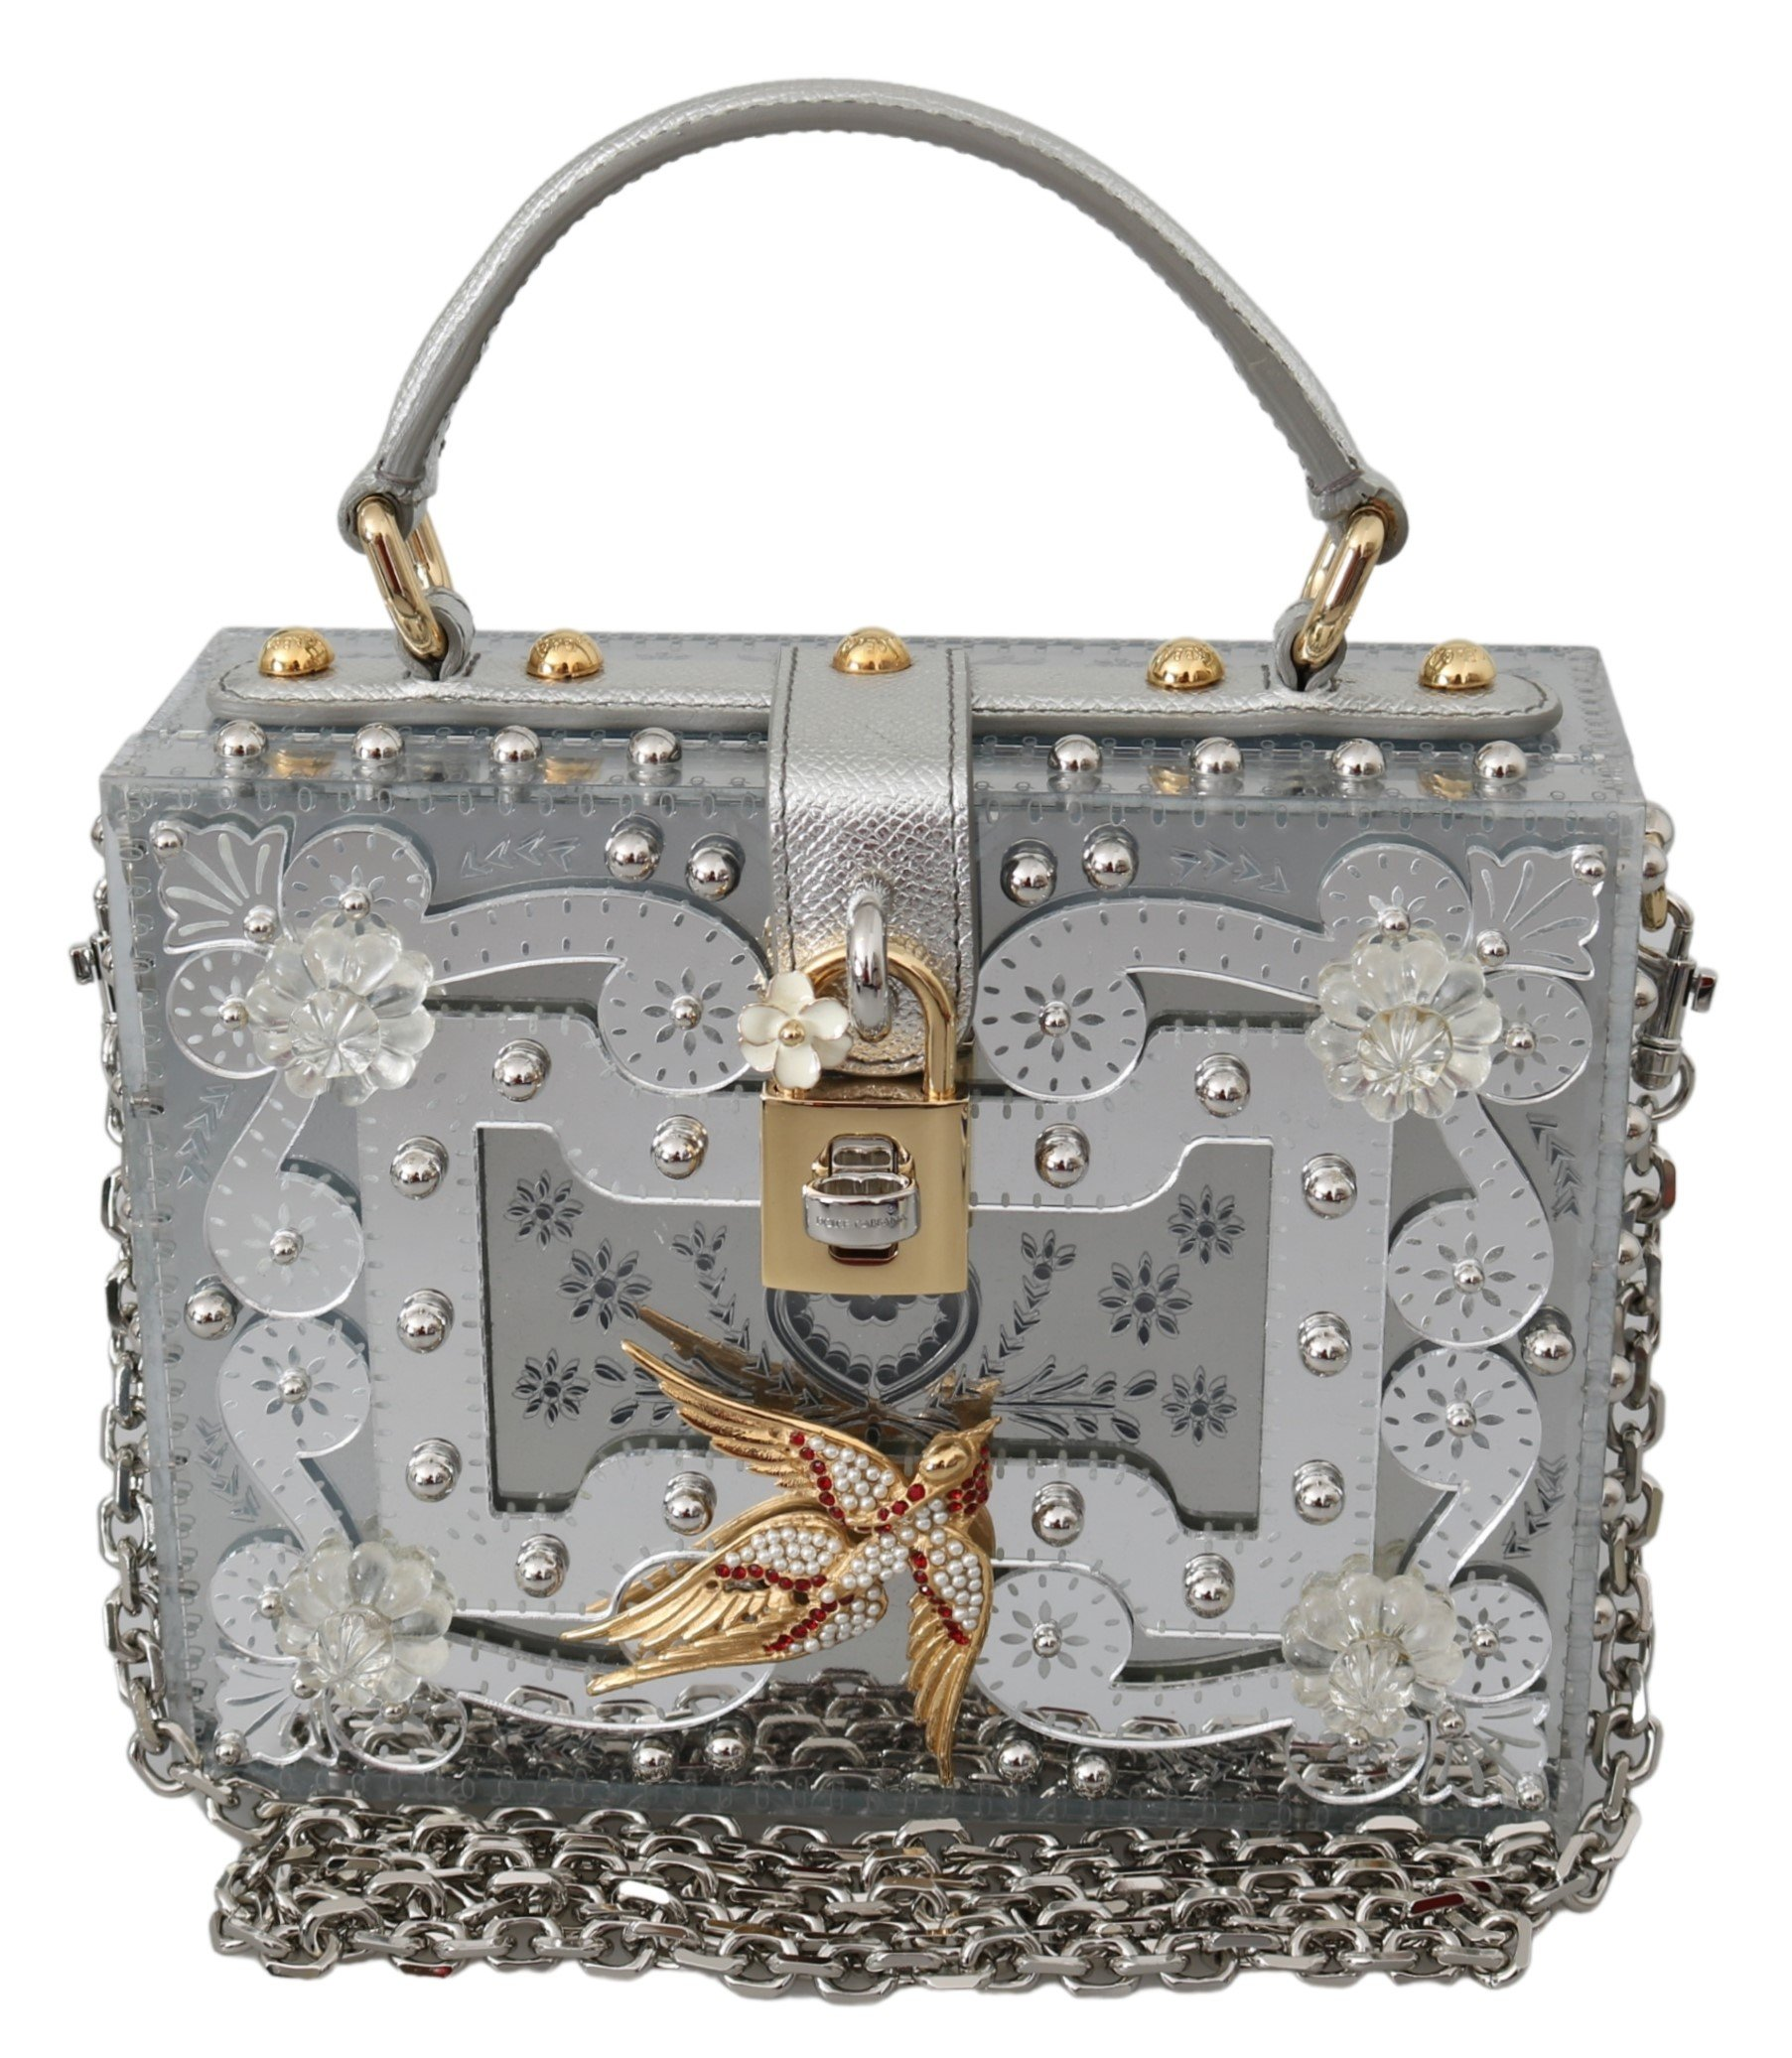 Dolce & Gabbana Women's Floral Padlock Clutch Bag Silver VAS10002